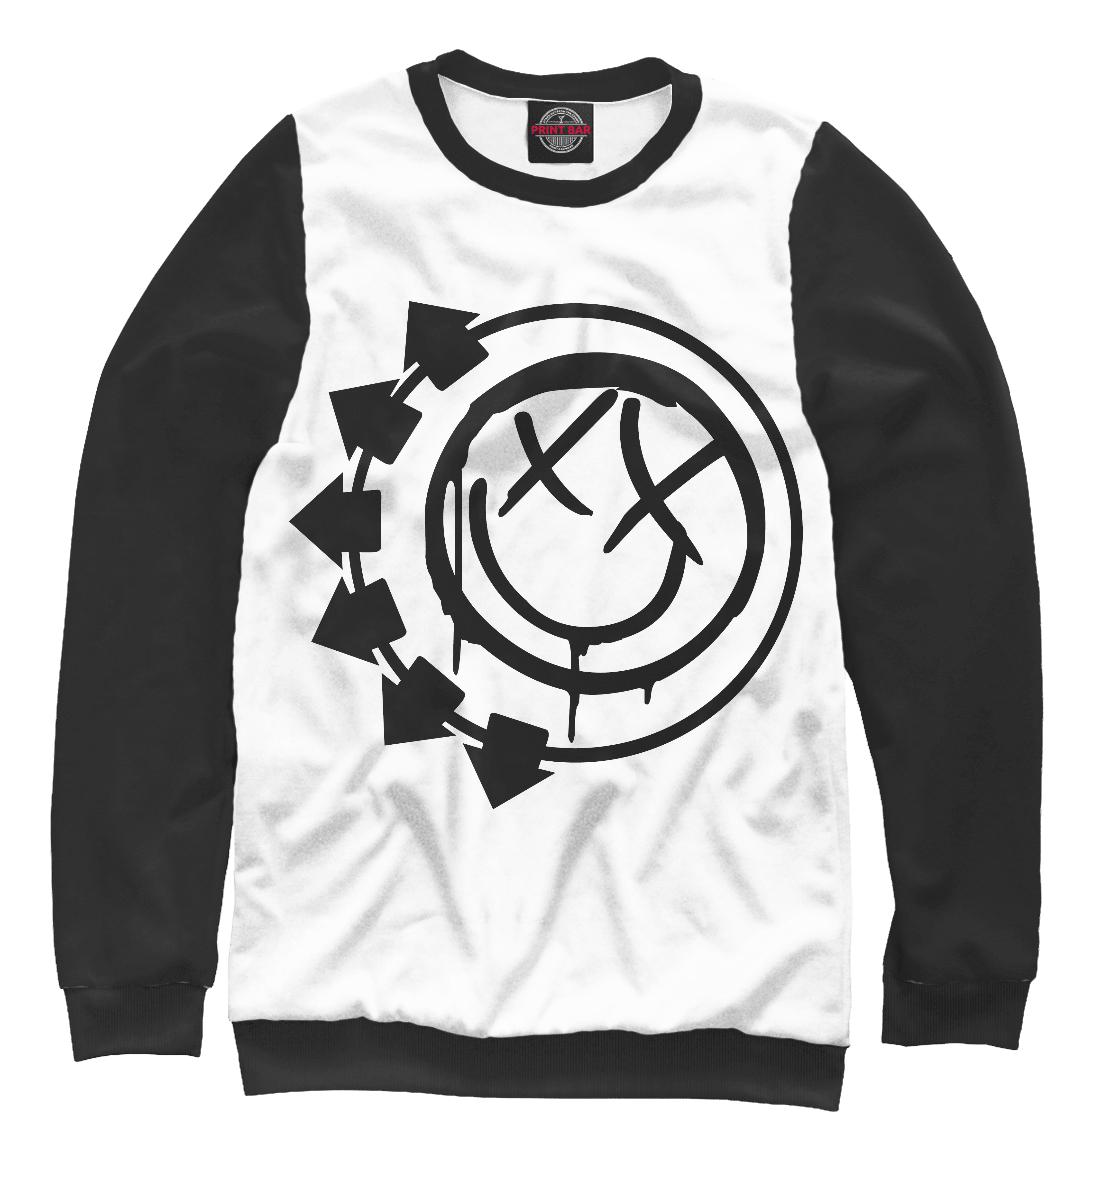 Купить Blink-182, Printbar, Свитшоты, BLI-476885-swi-1